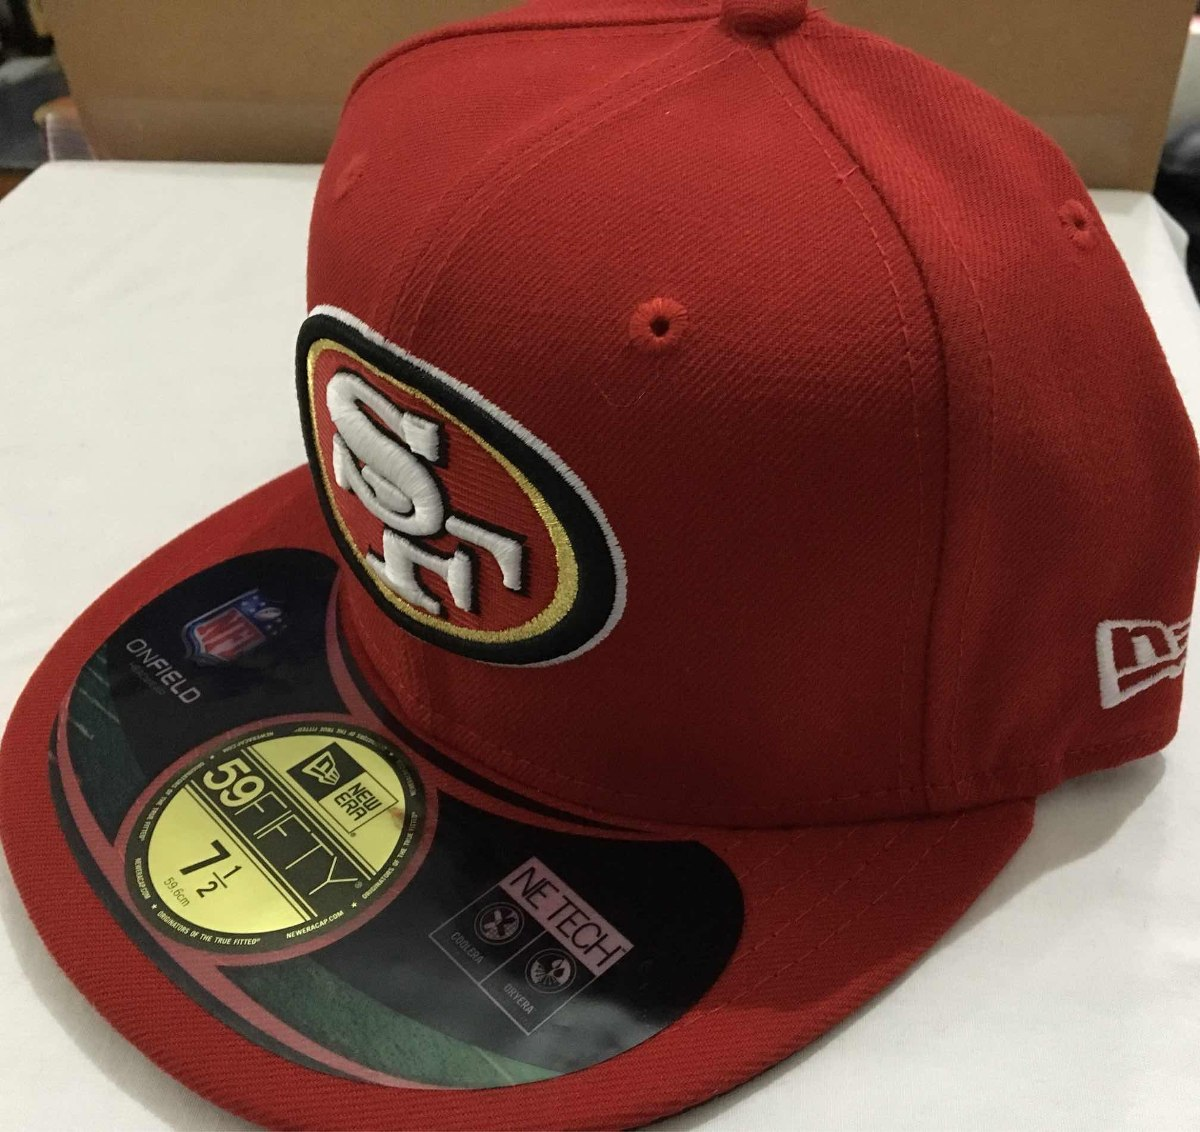 Nfl San Francisco 49ers Niners Gorra New Era 7 1 2 -   680.00 en ... 5ceed876f67